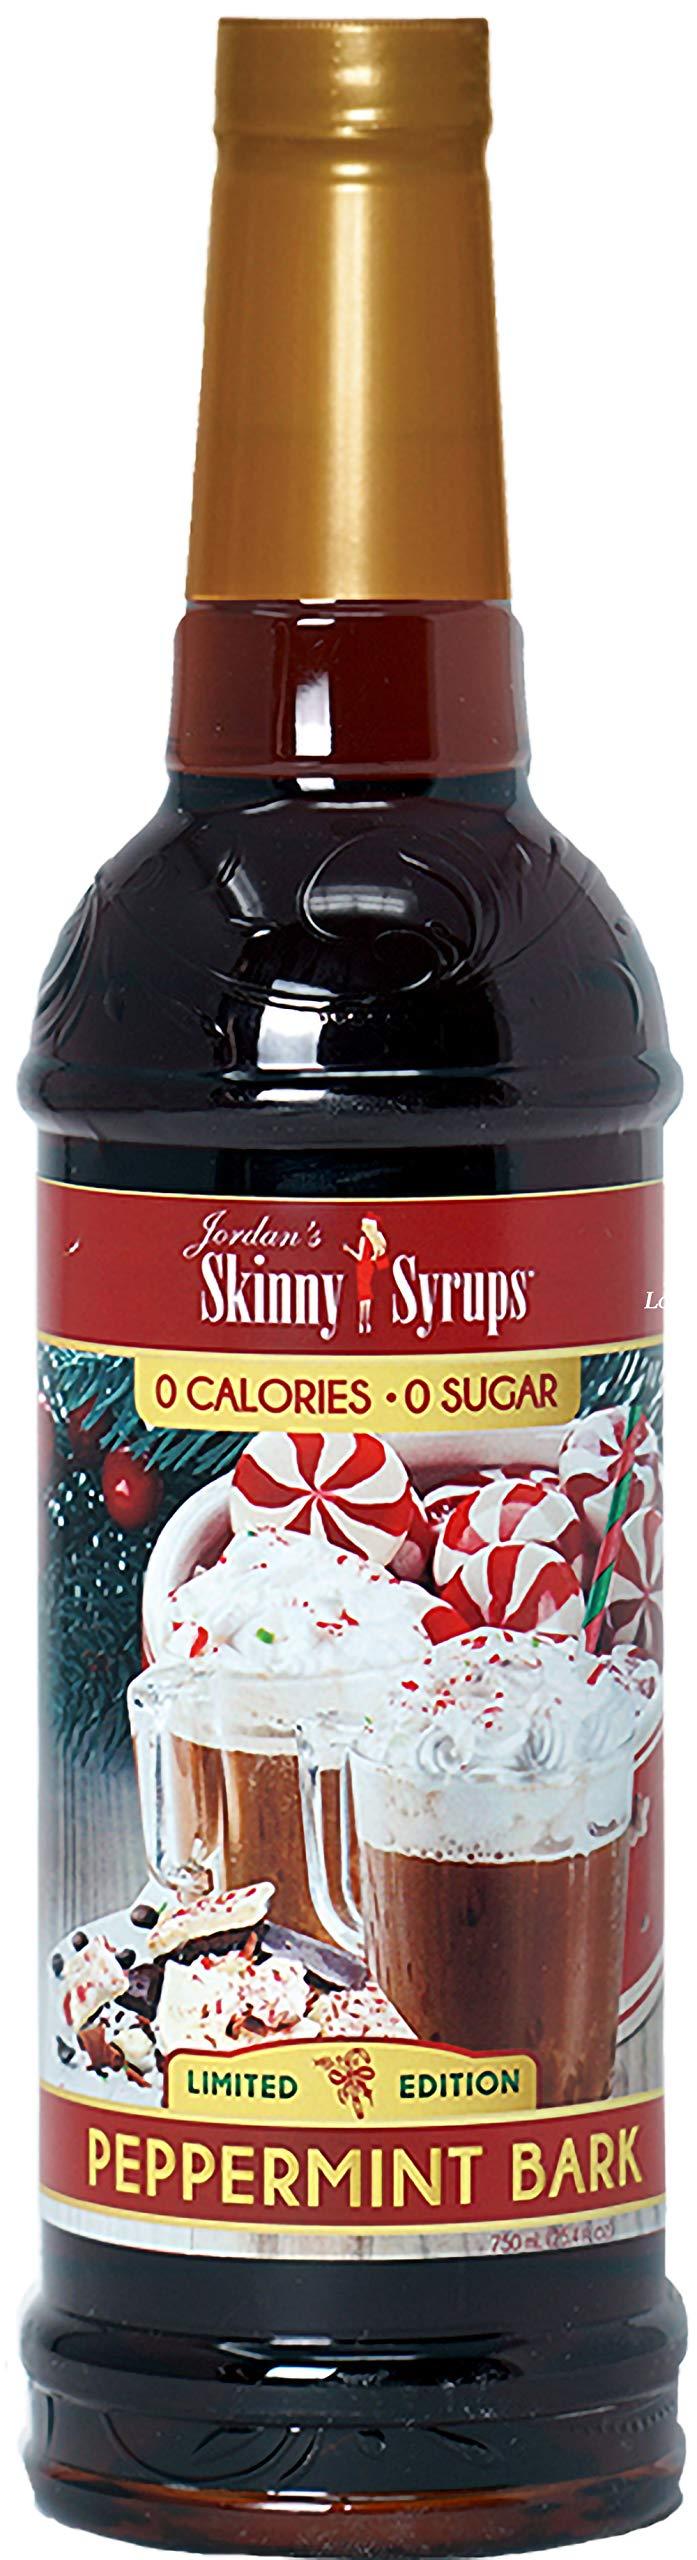 Jordan's Skinny Syrups 0 Sugar Peppermint Bark Coffee Syrup